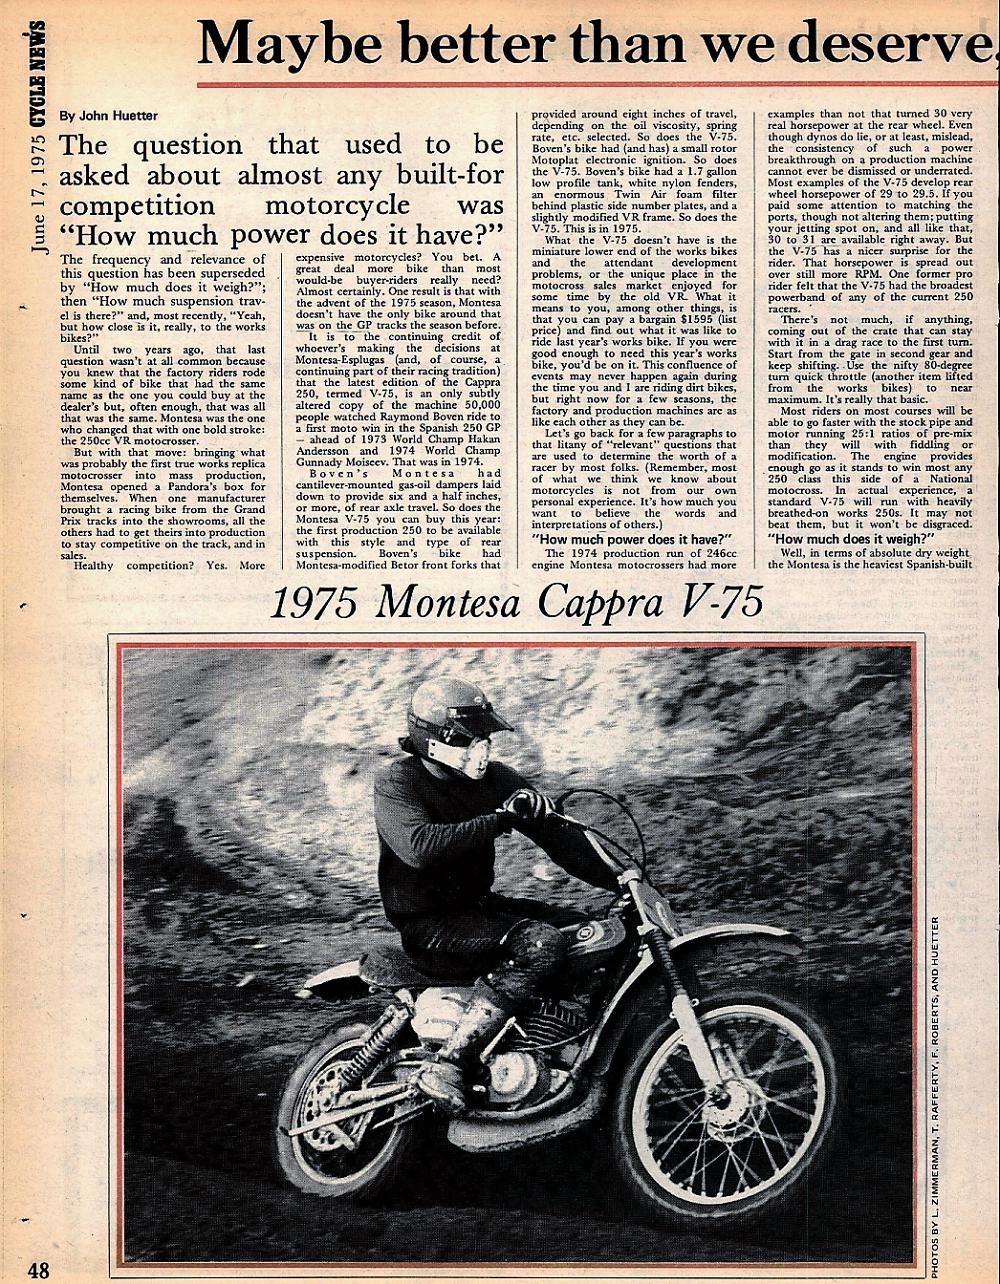 1975 Montesa Cappra V-75 road test. 1.jpg